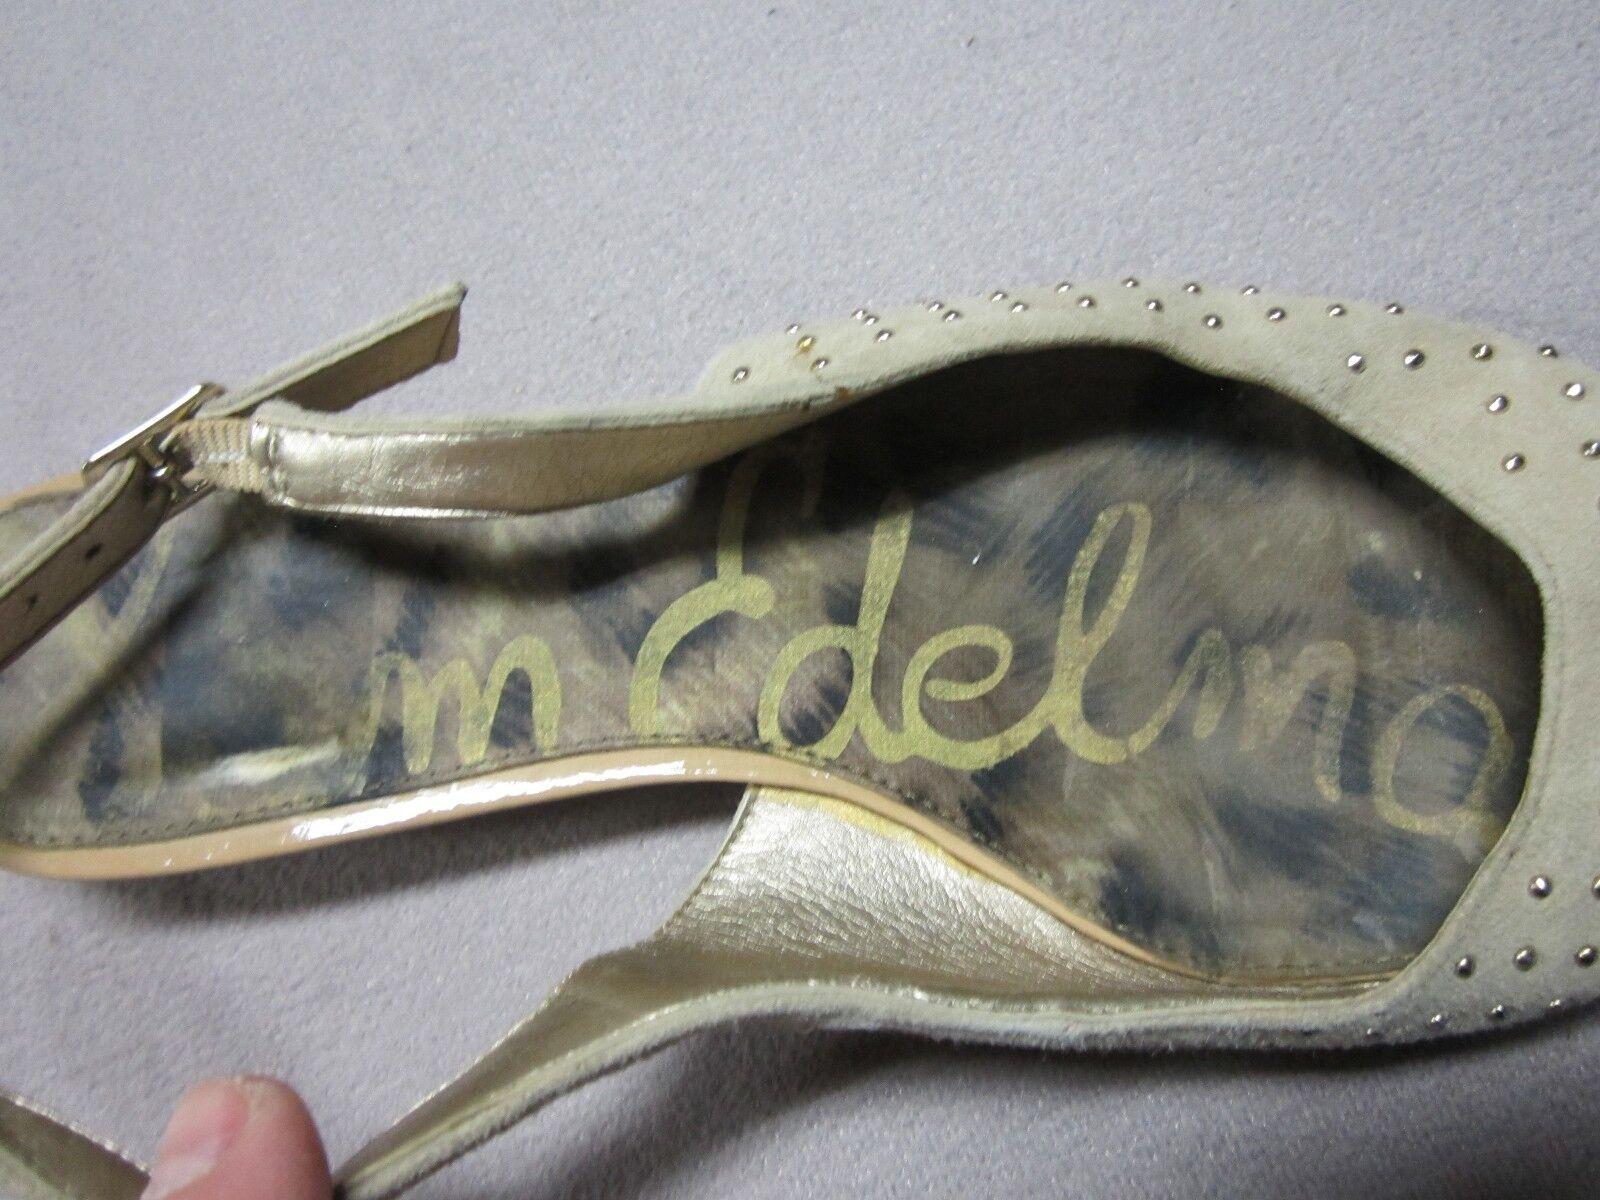 SAM SLINGBACK EDELMAN IDAHLIA Donna RARE STUDDED SLINGBACK SAM NATURAL SLIP ON SHOES SIZE 7.5 924428